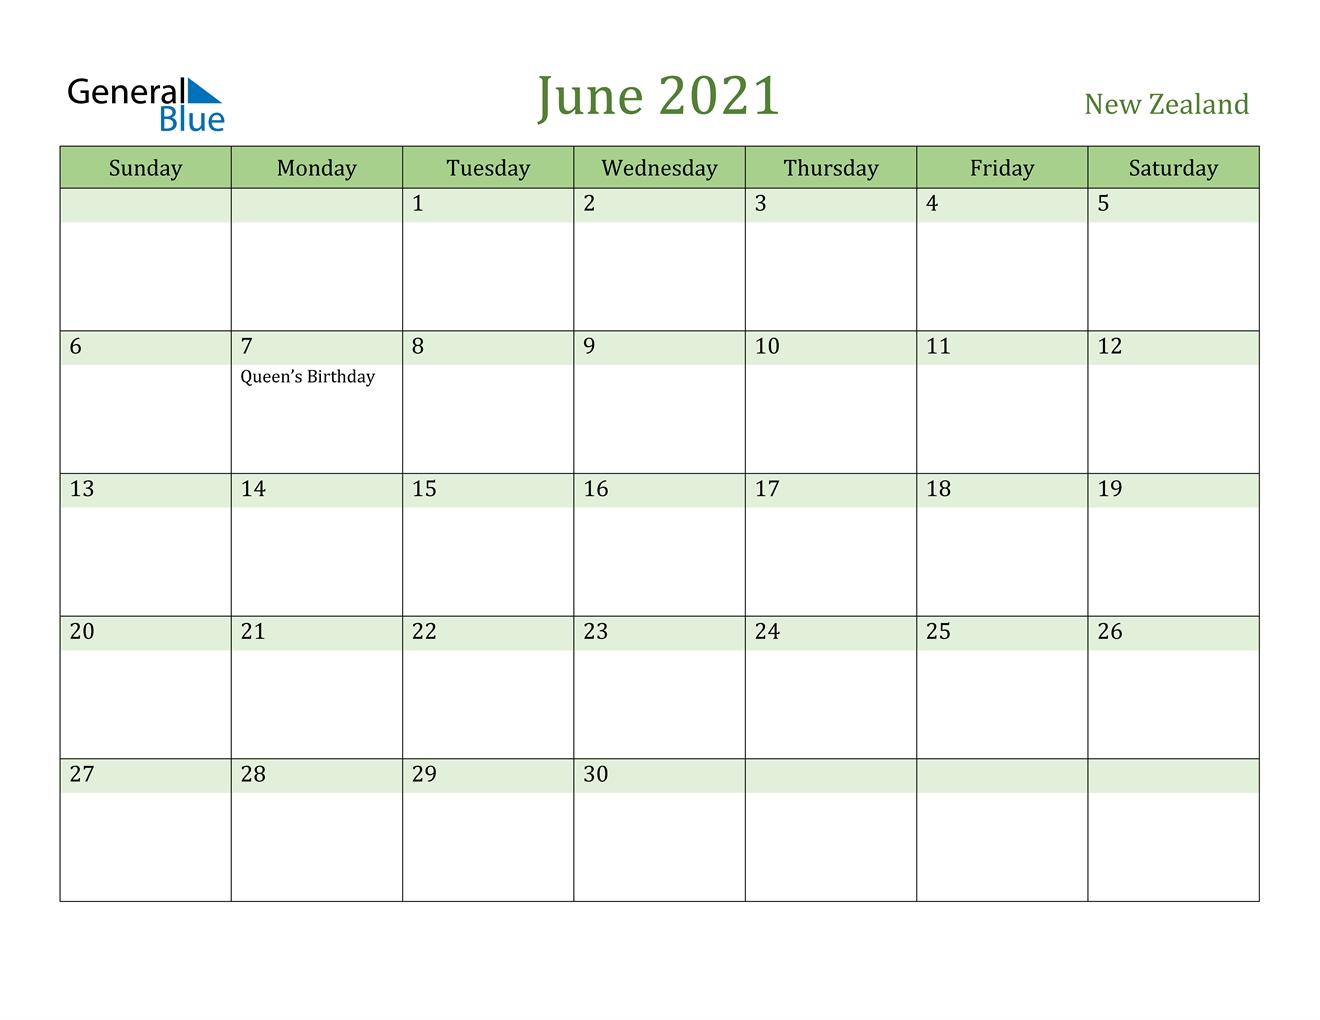 June 2021 Calendar - New Zealand June 2021 Calendar With Holidays Printable